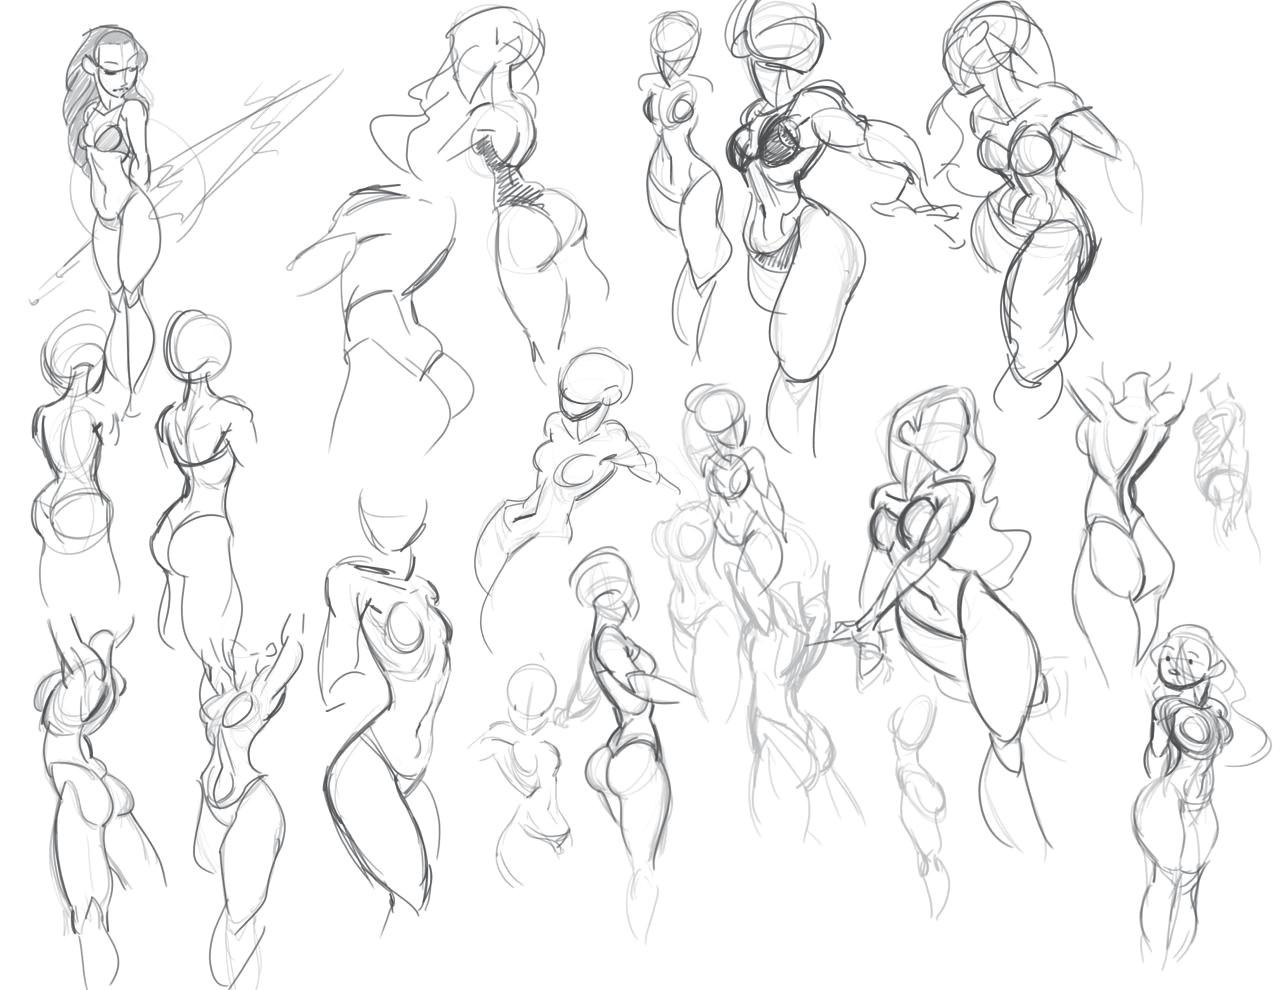 http malconpierce tumblr com image 138143266169 figure sketching